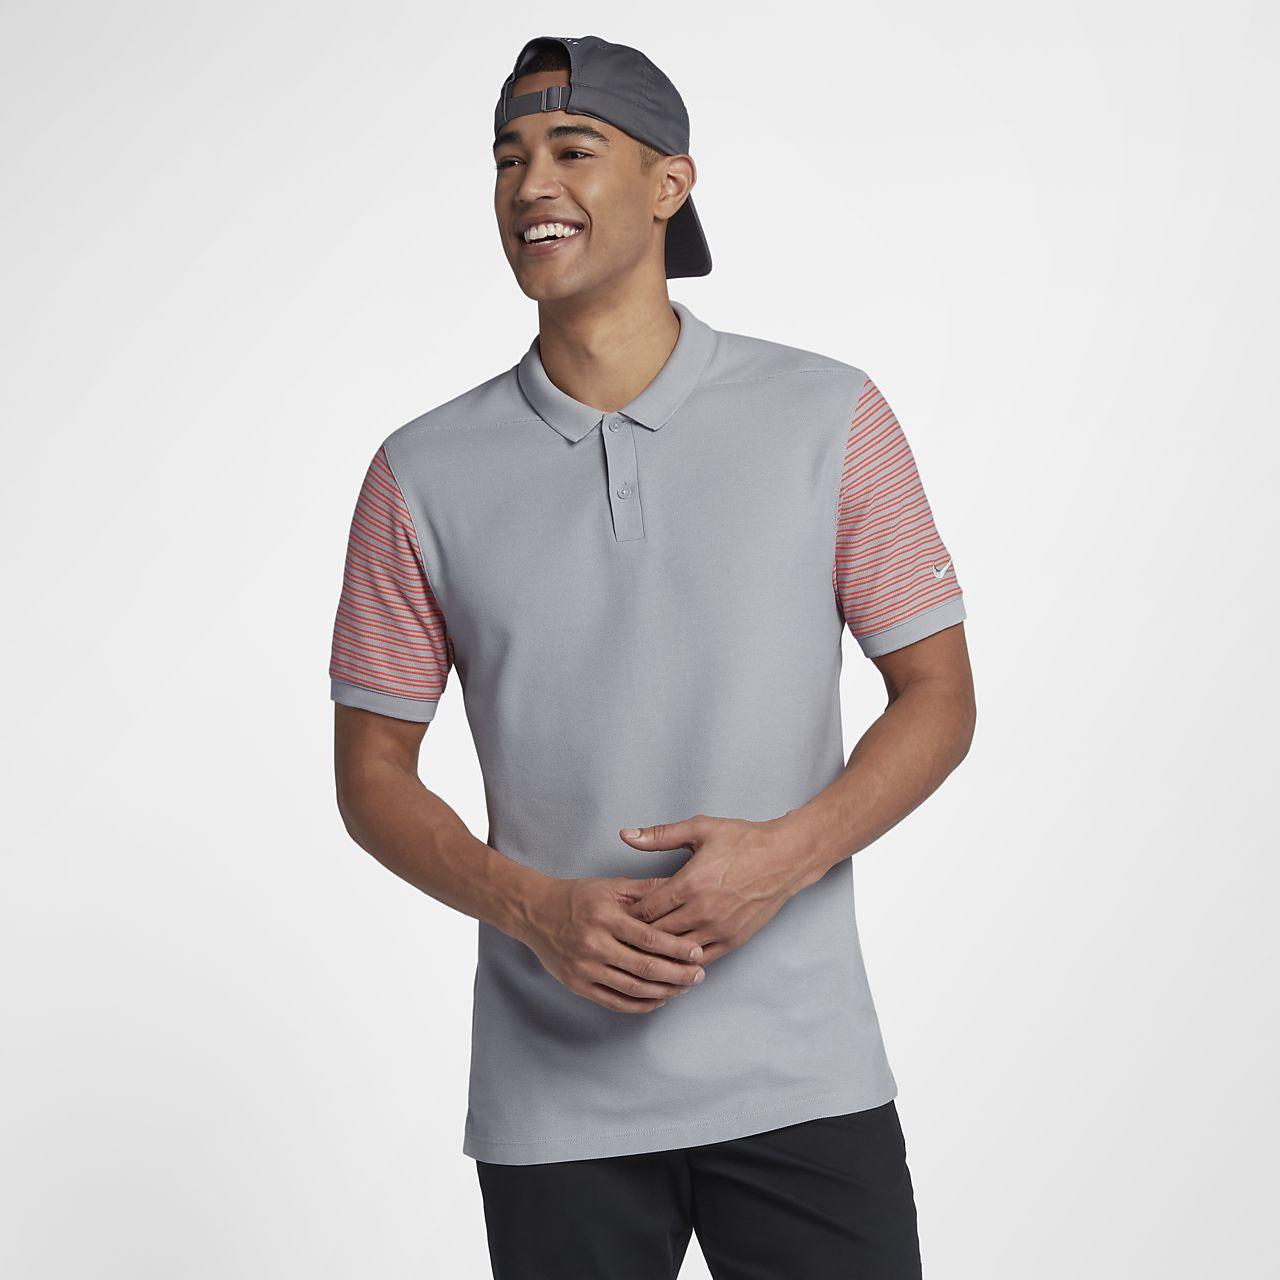 Nike Polo T Shirt Size Chart Rldm